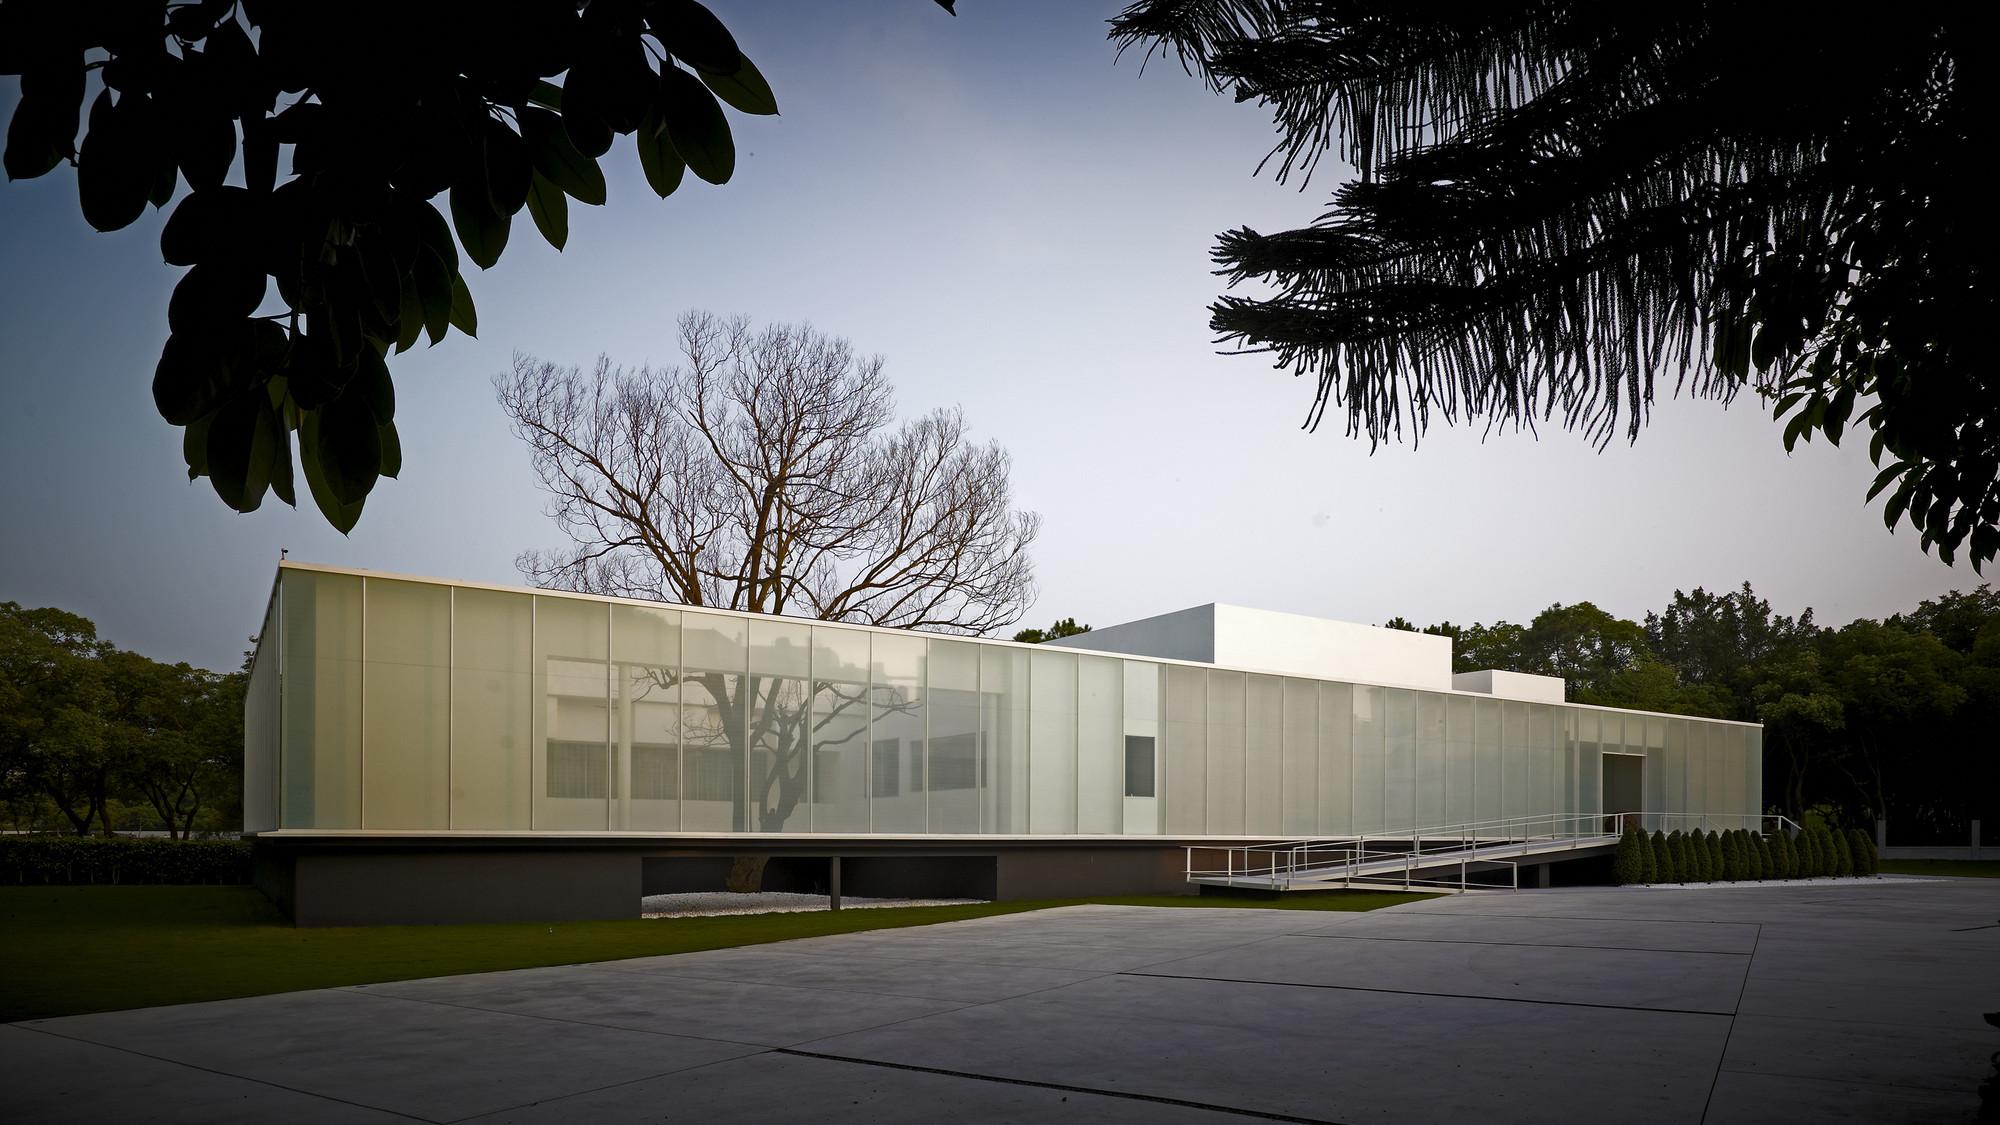 Gallery of lightbox hsuyuan kuo architect associates 22 for Architect associates